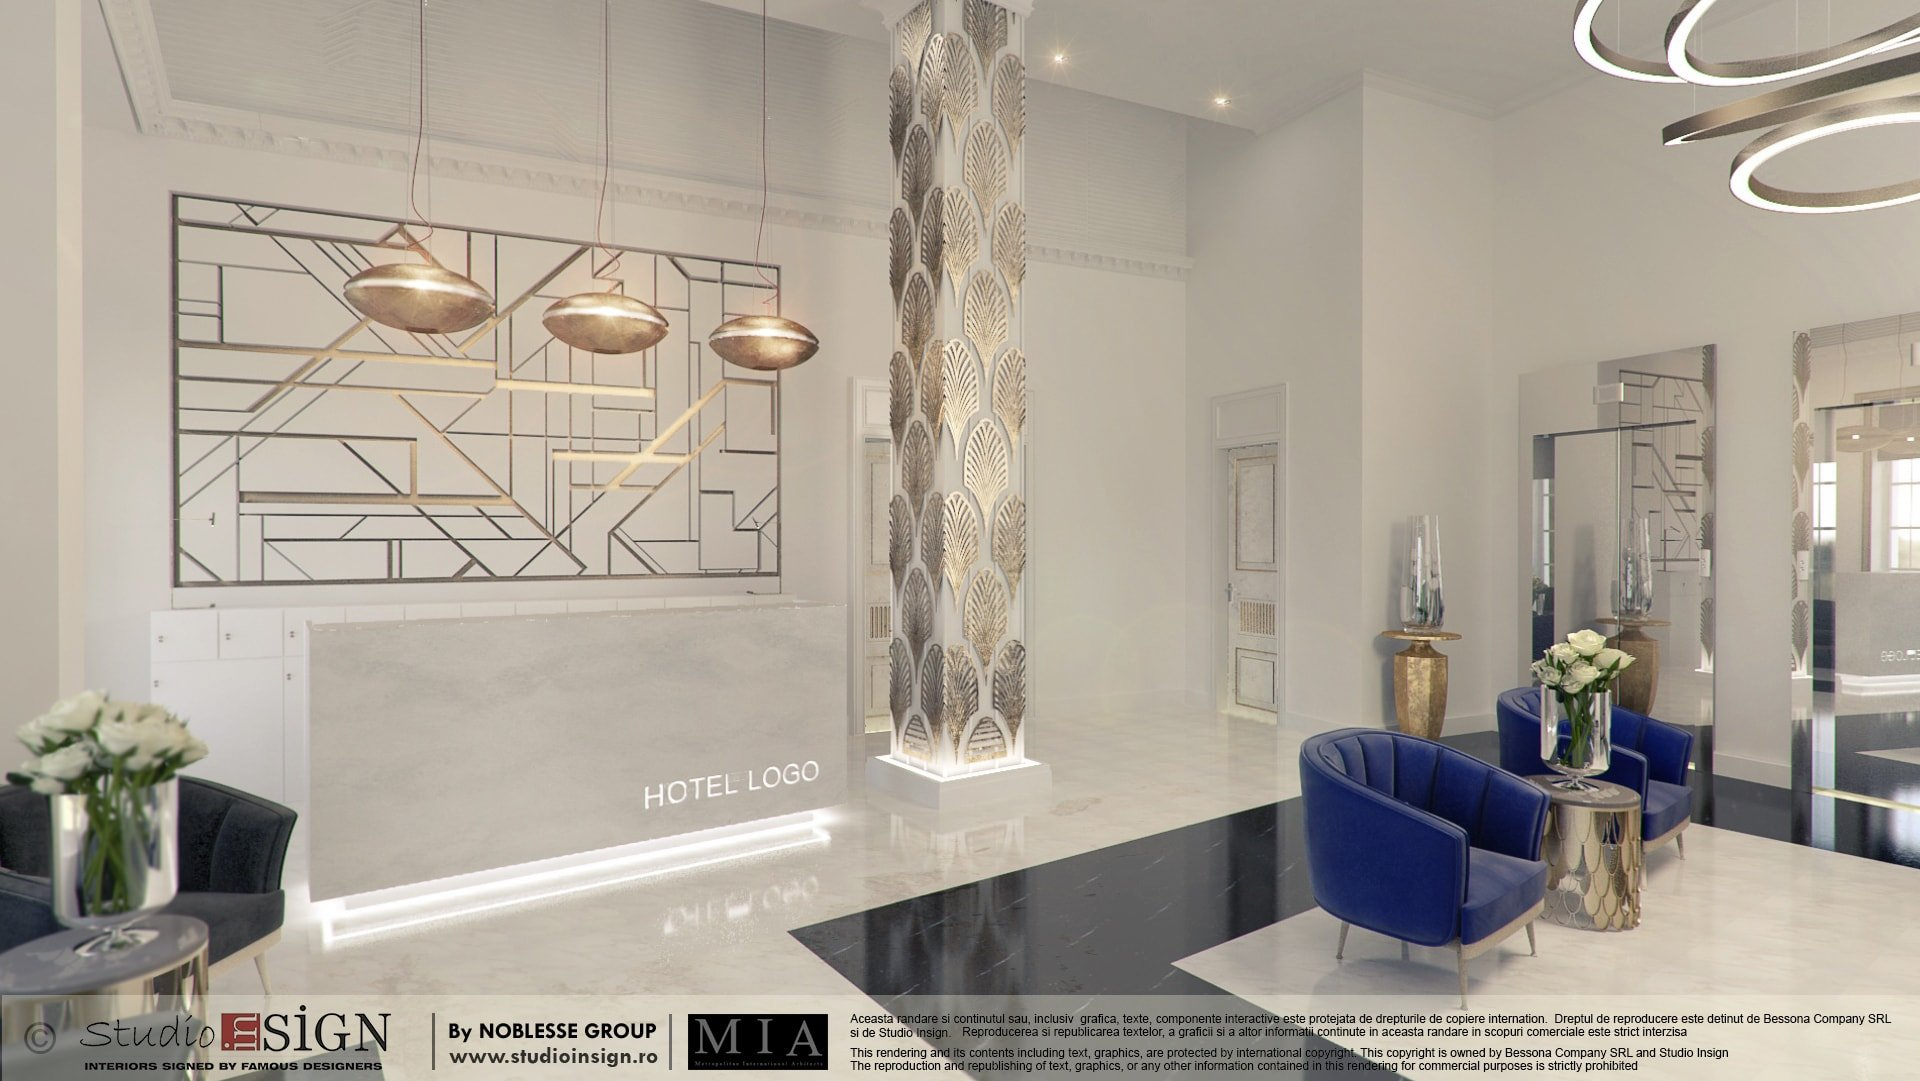 hotel 5 stars bucharest art deco interior design studio insign. Black Bedroom Furniture Sets. Home Design Ideas